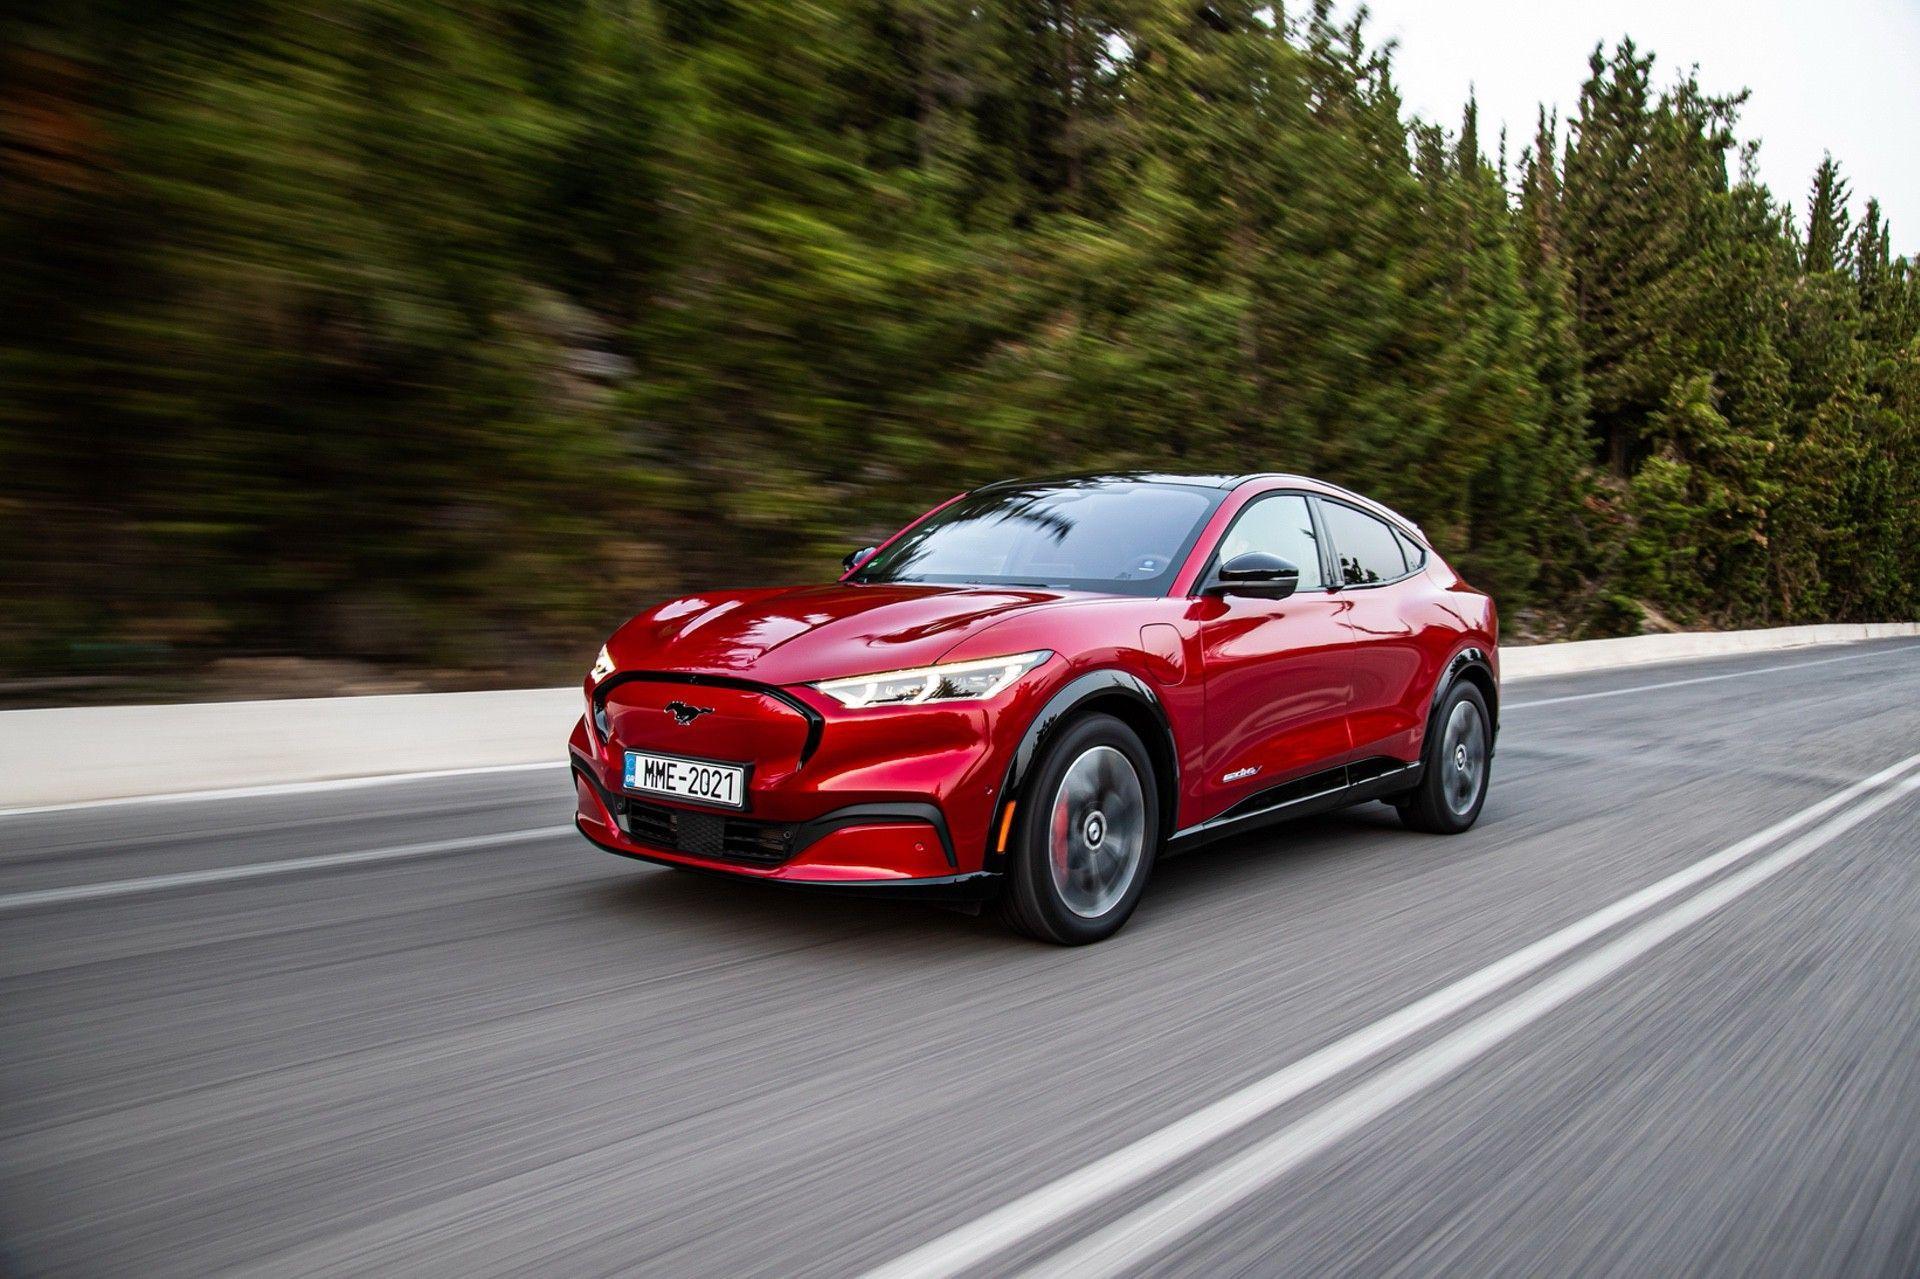 Ford_Mustang_Mach-E_greek_presskit-0079